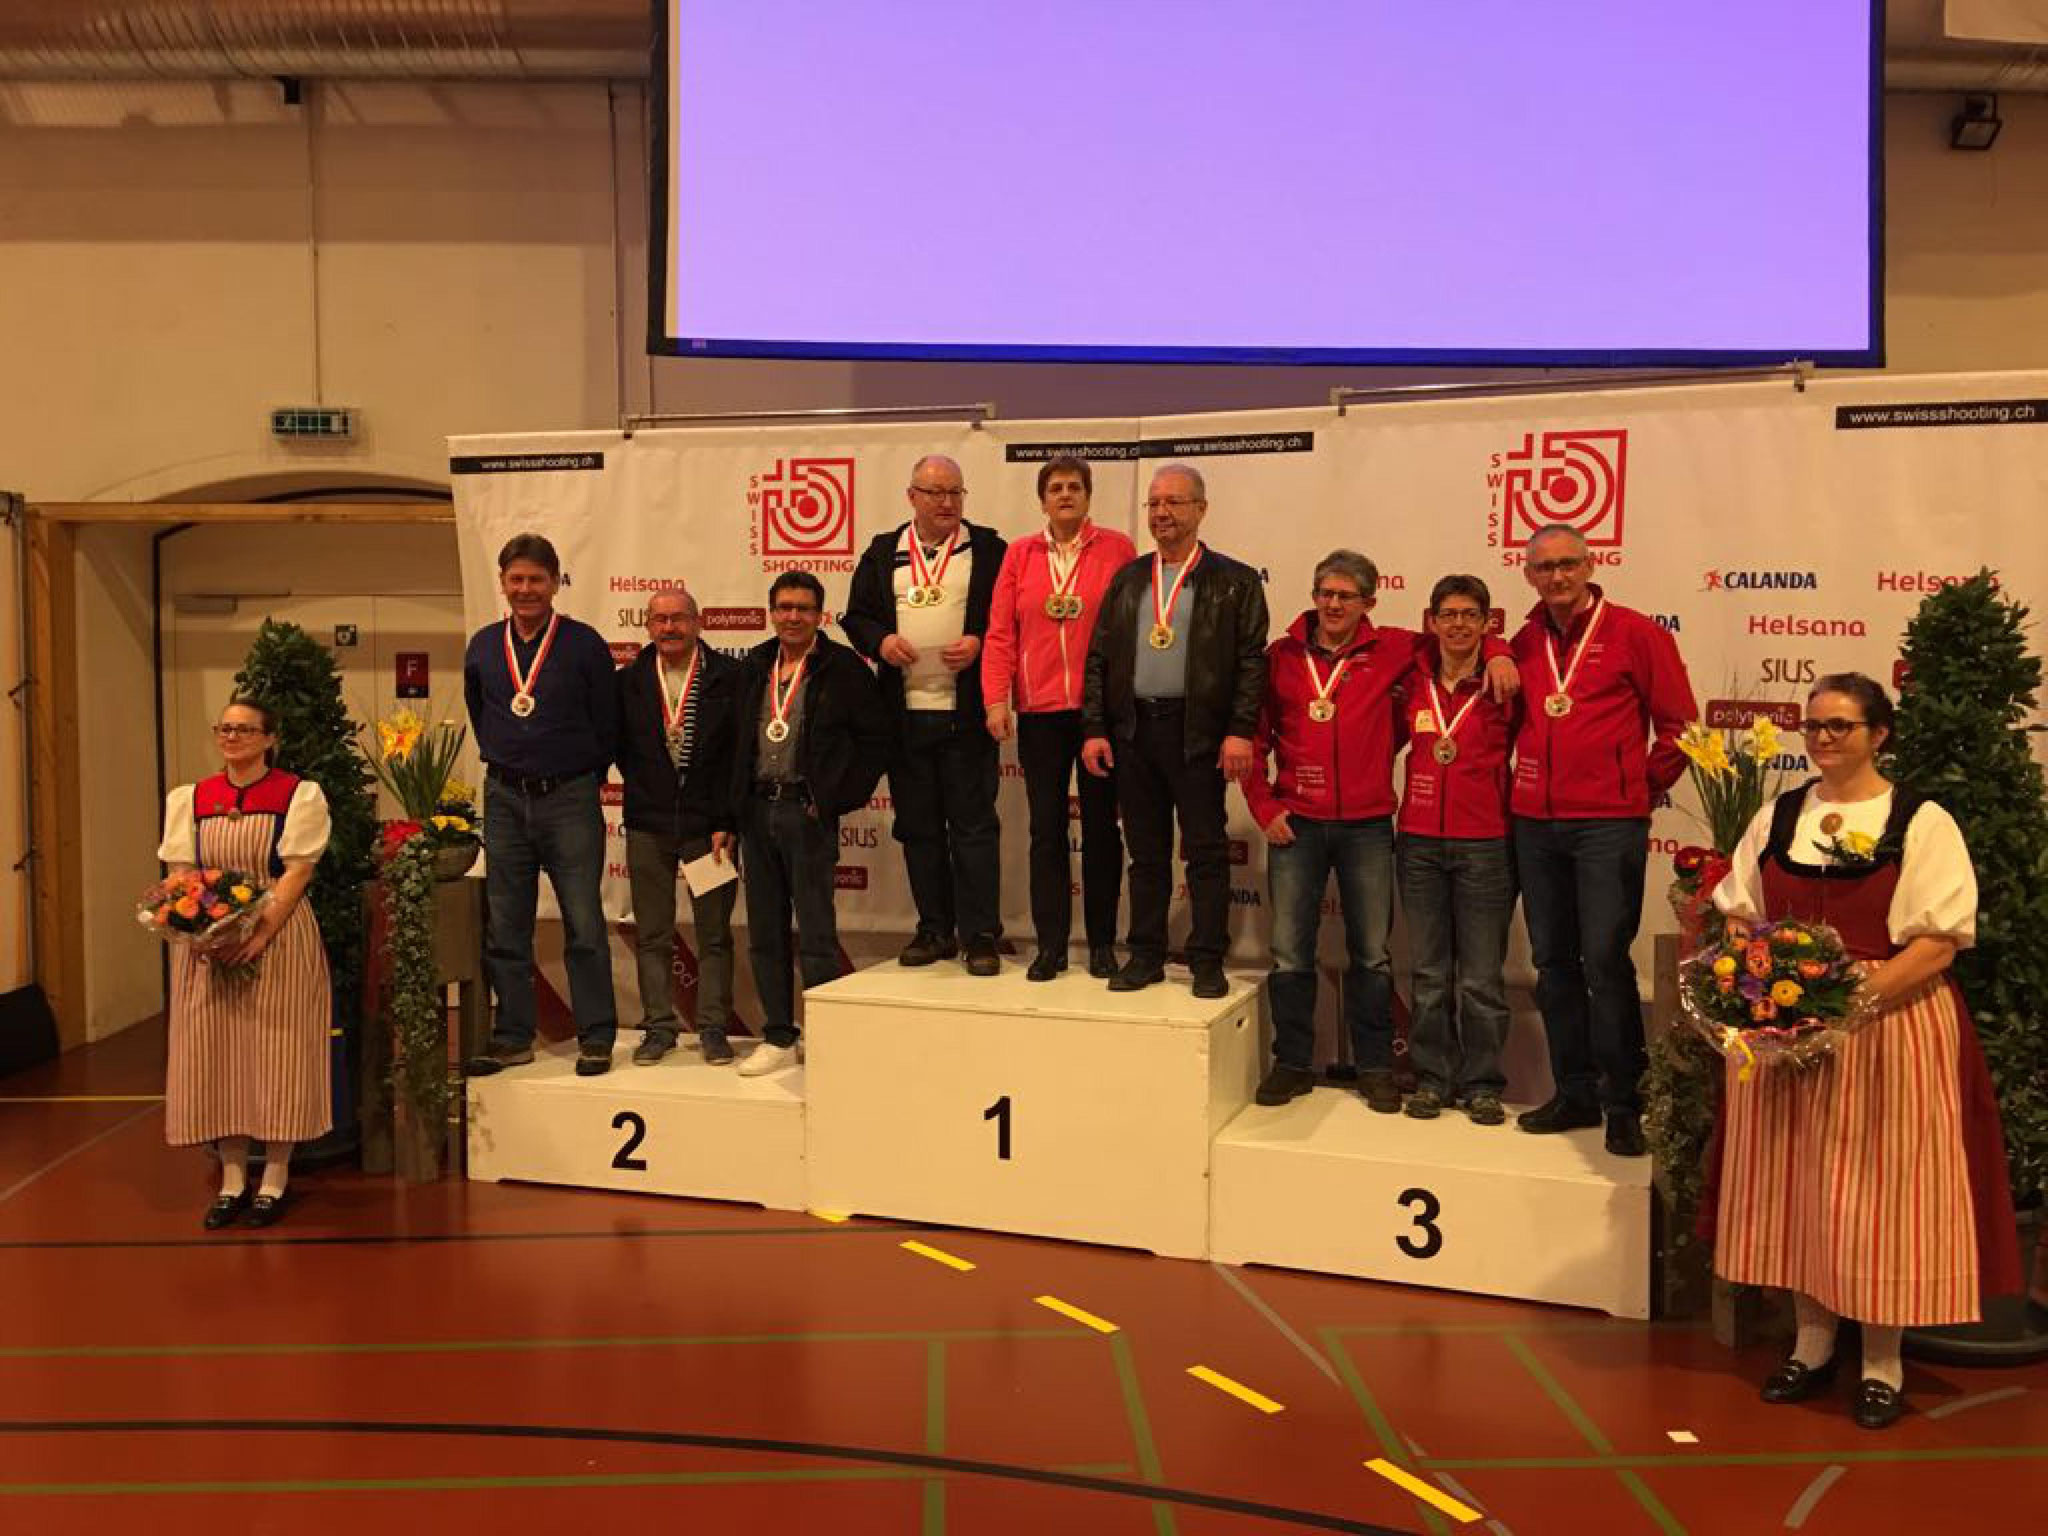 10m Schweizermeisterschaft 2017 in Bern - Senioren Auflageschiessen Gruppe 3. Rang Placi C., Yvonne M., Corsin D.